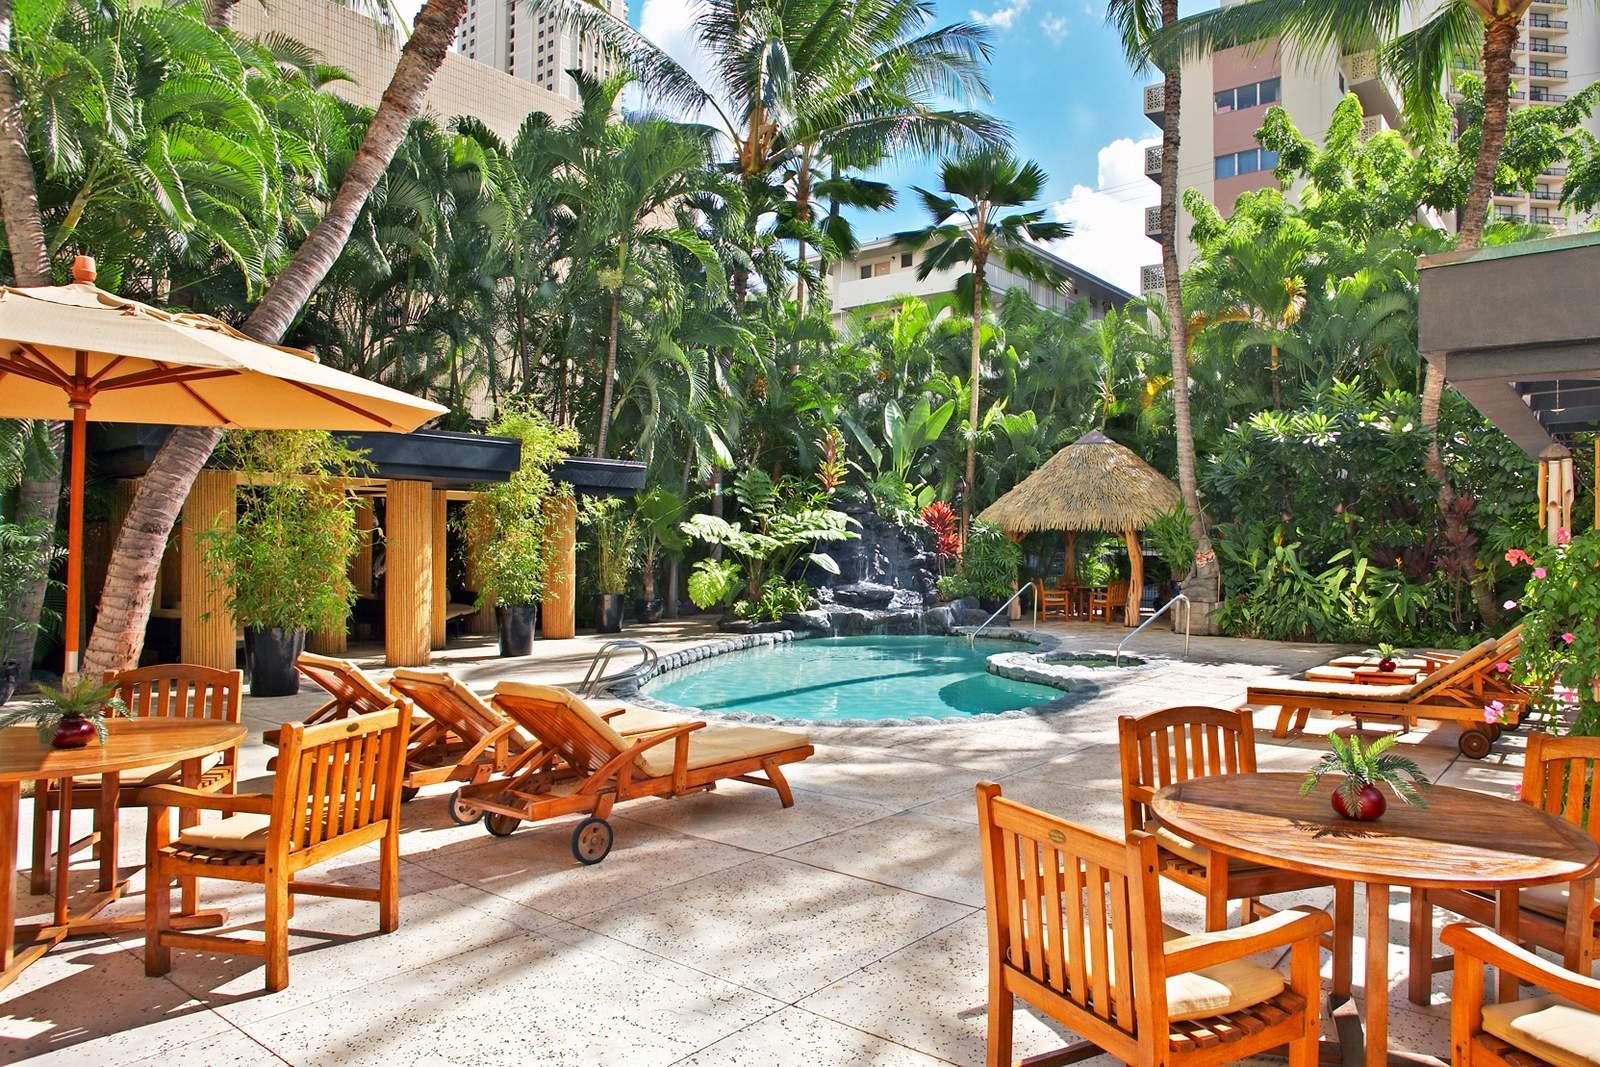 Impression Aqua Bamboo and Spa Waikiki